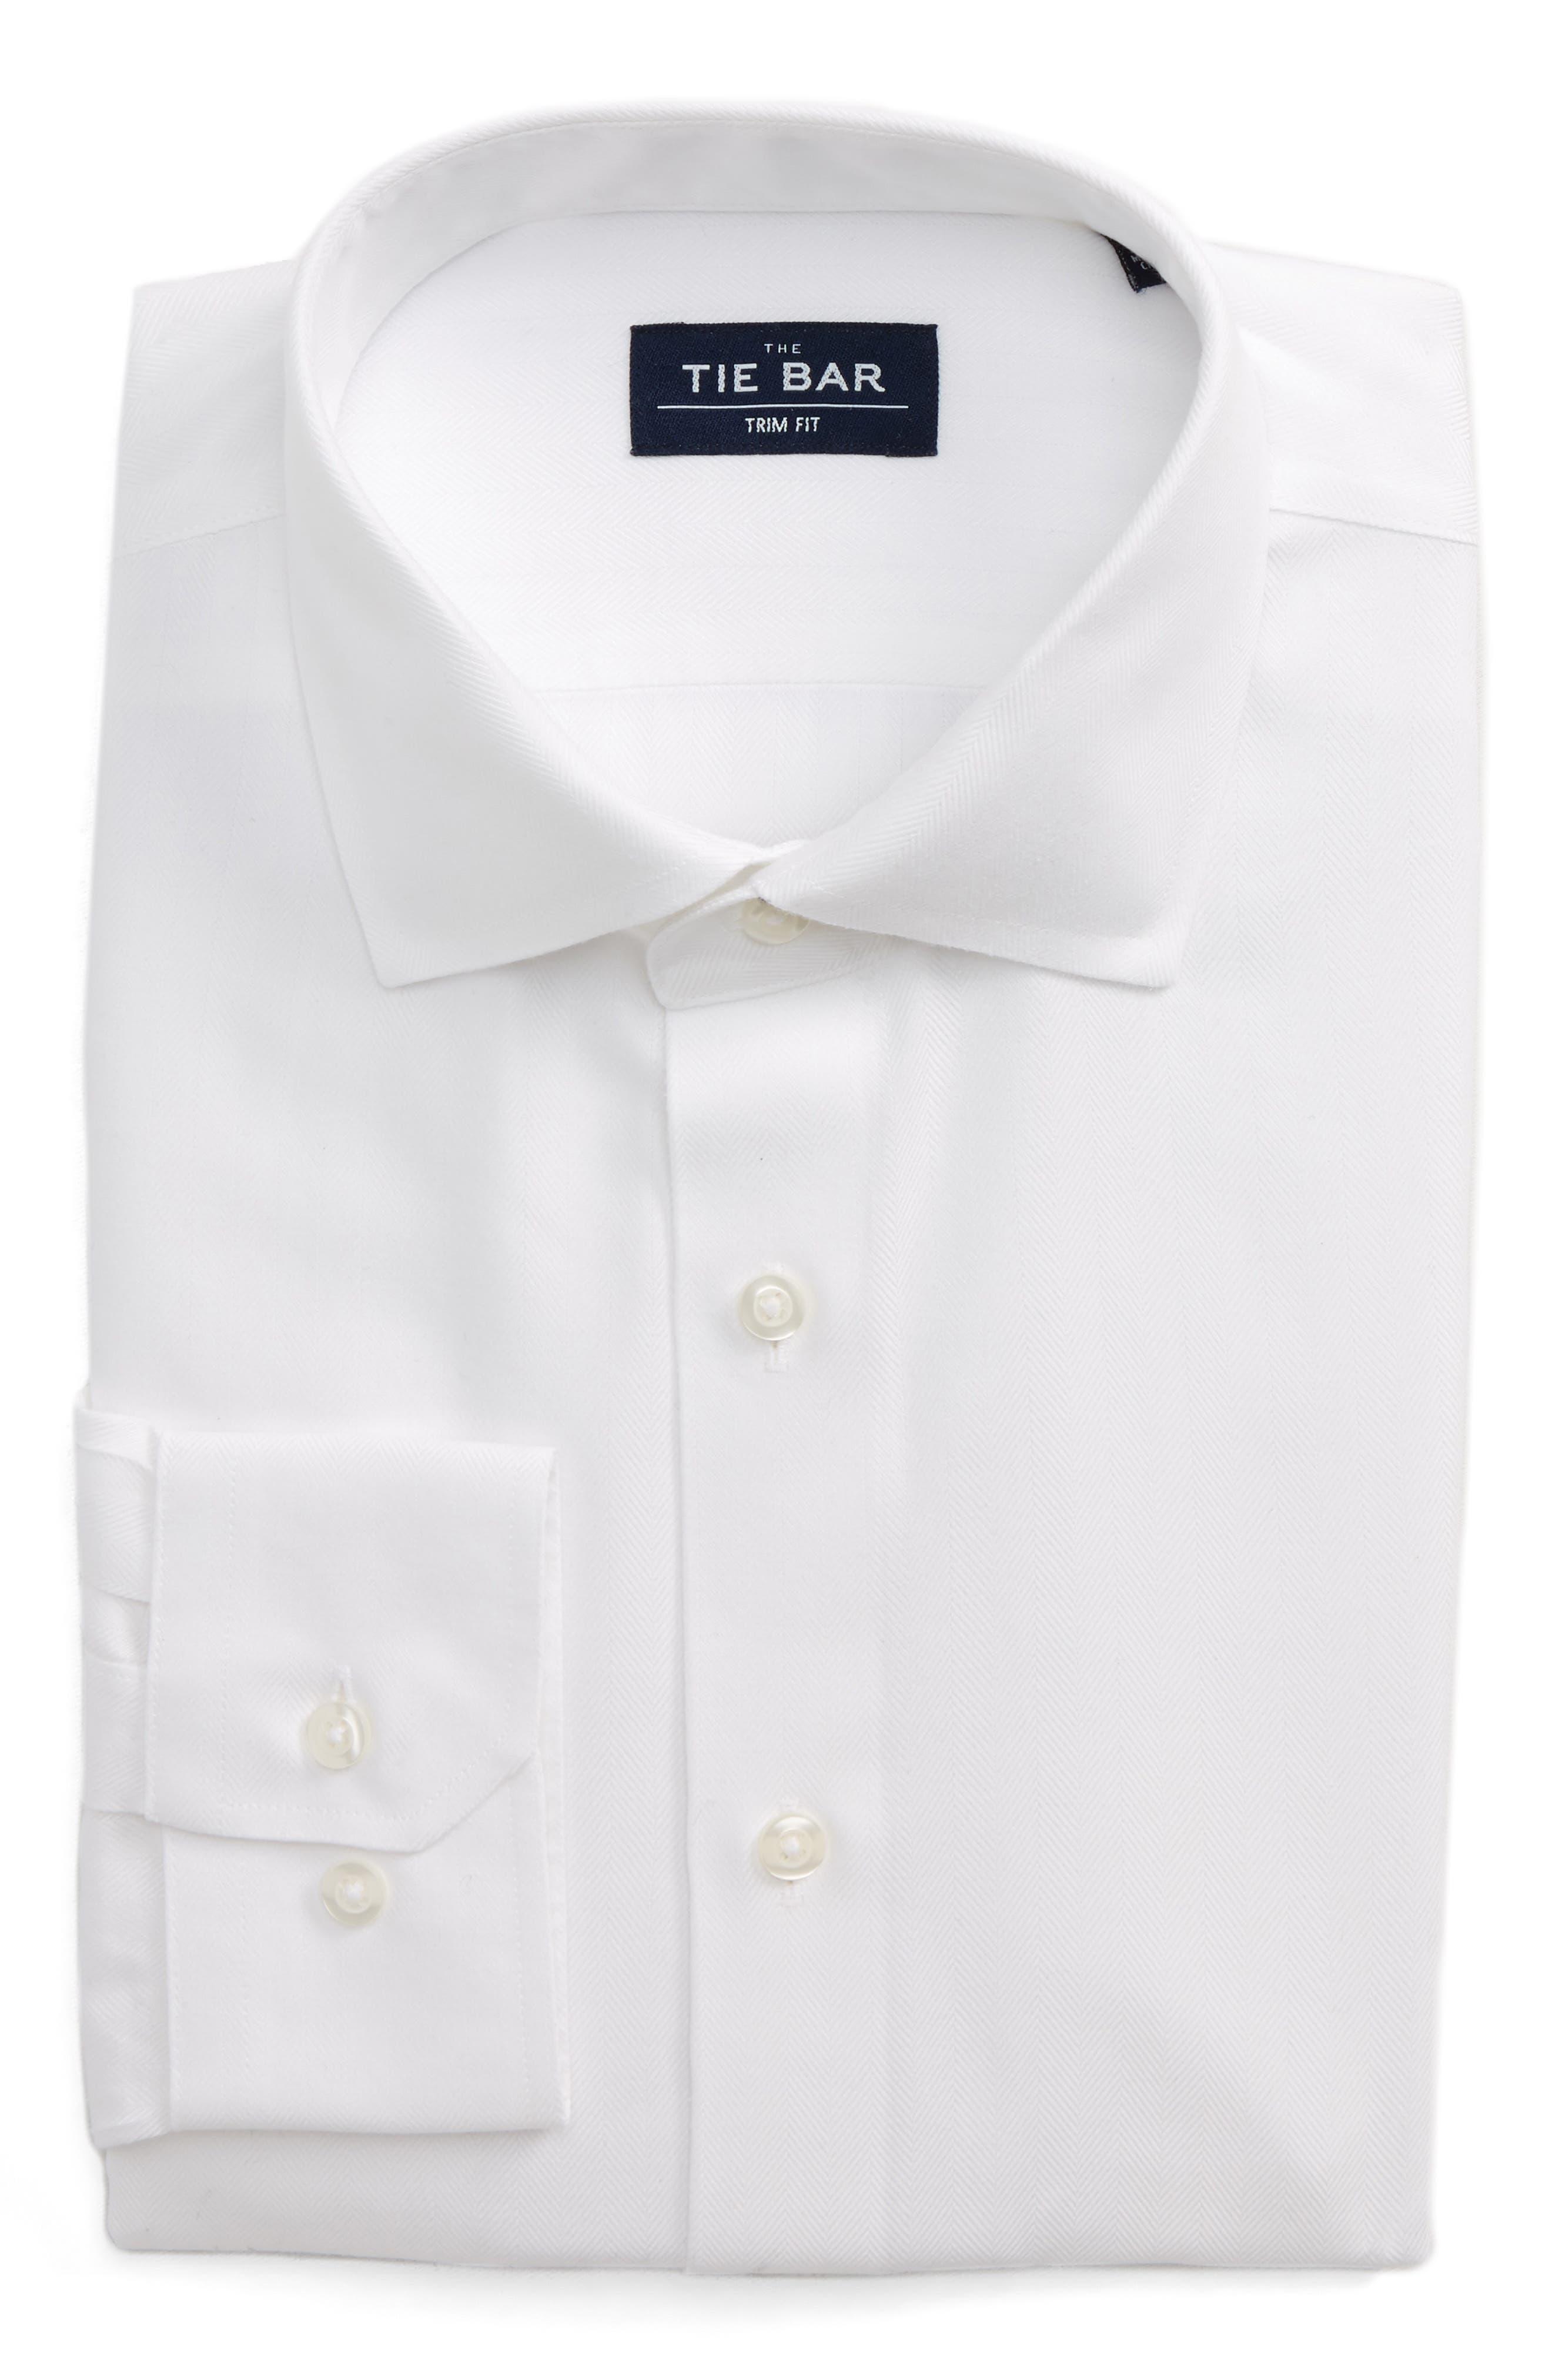 The Tie Bar Trim Fit Herringbone Dress Shirt